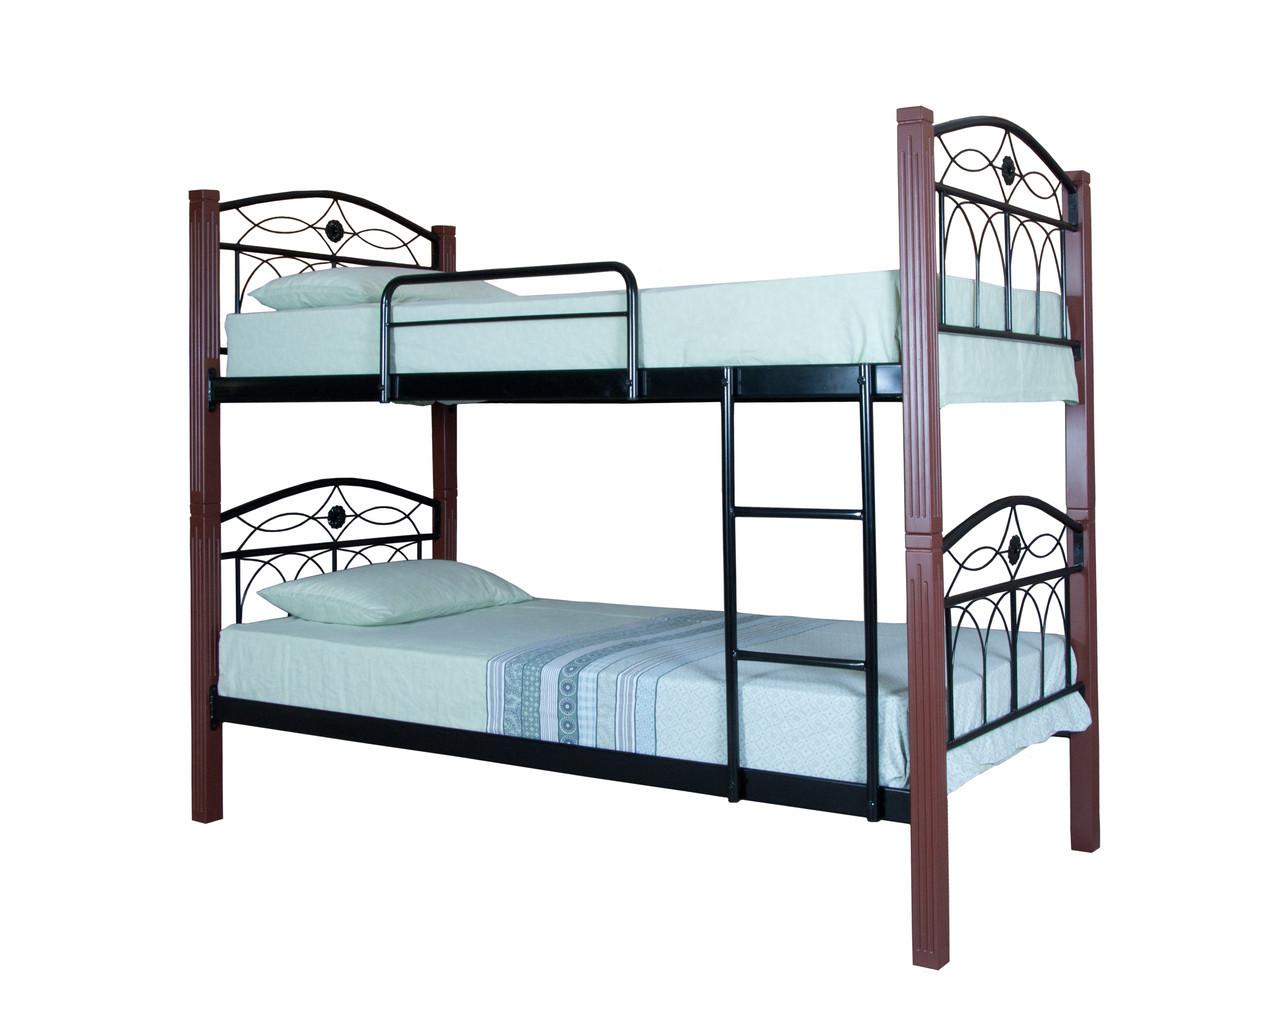 Кровать Элизабет двухъярусная  200х90, белая